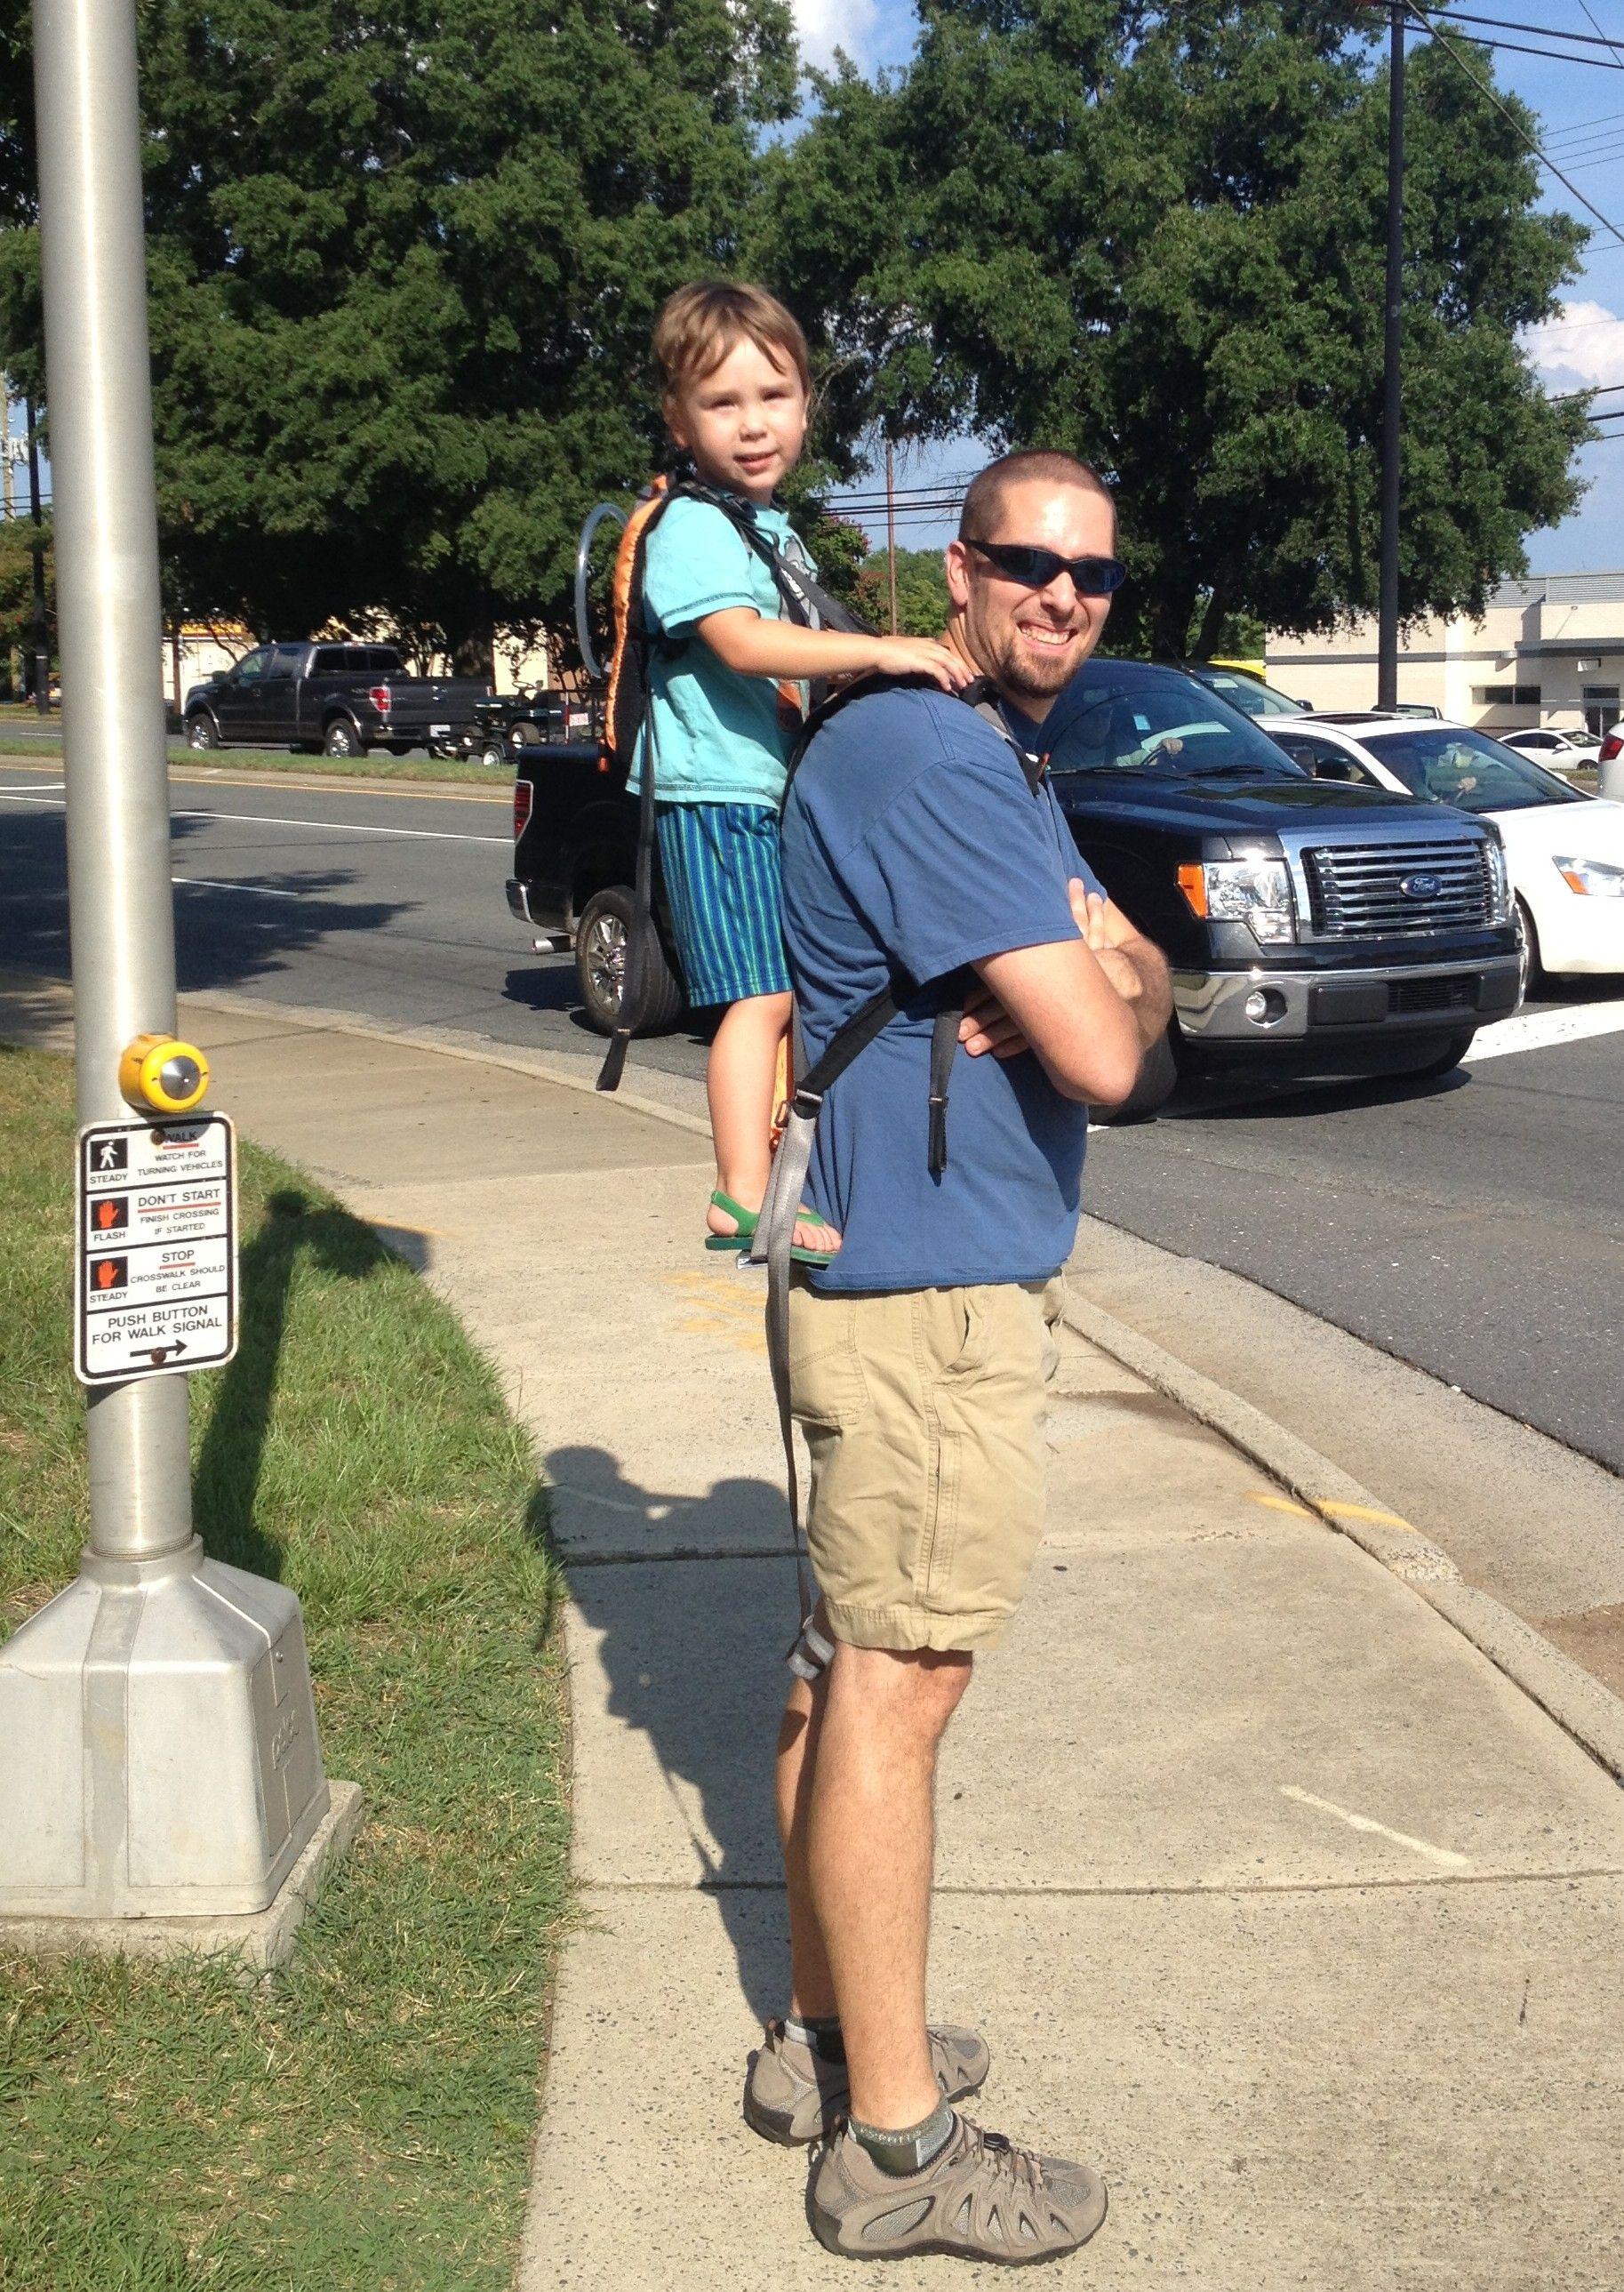 NEW!! EXPLORER Toddler Carrier Standing Child Carrier